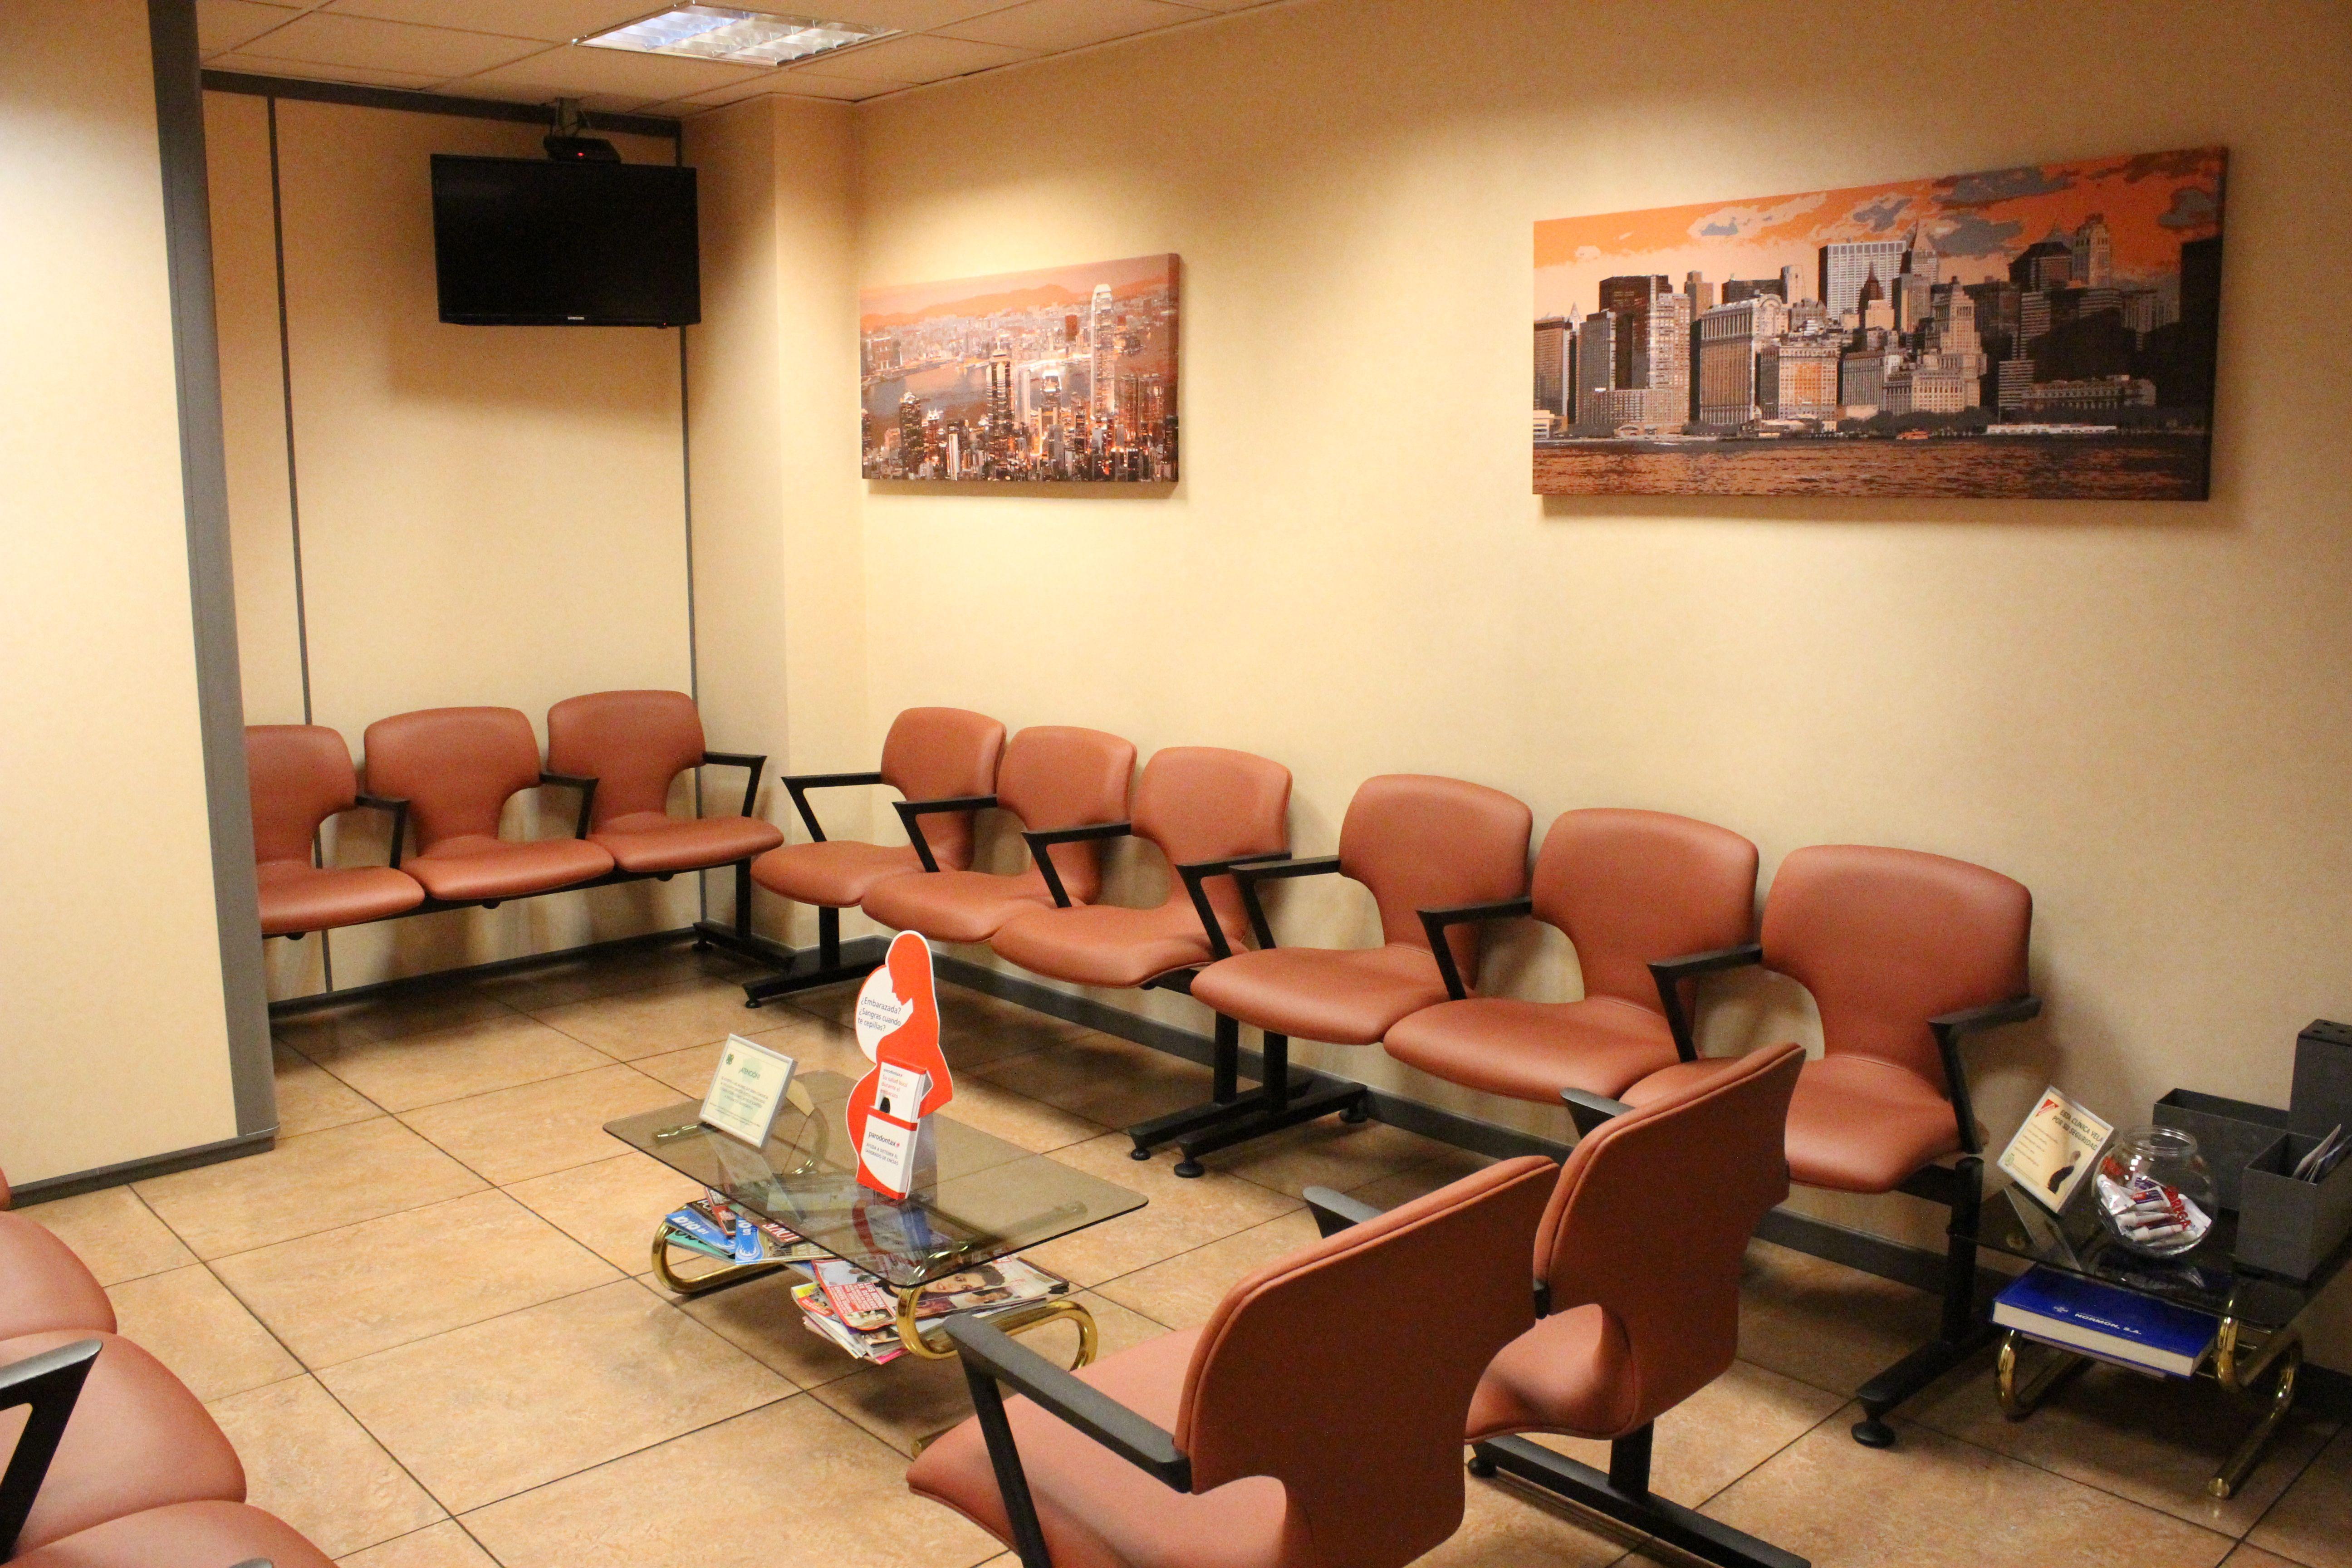 Foto 7 de Dentistas en Madrid | Clínica Dental Dr. Bassanini